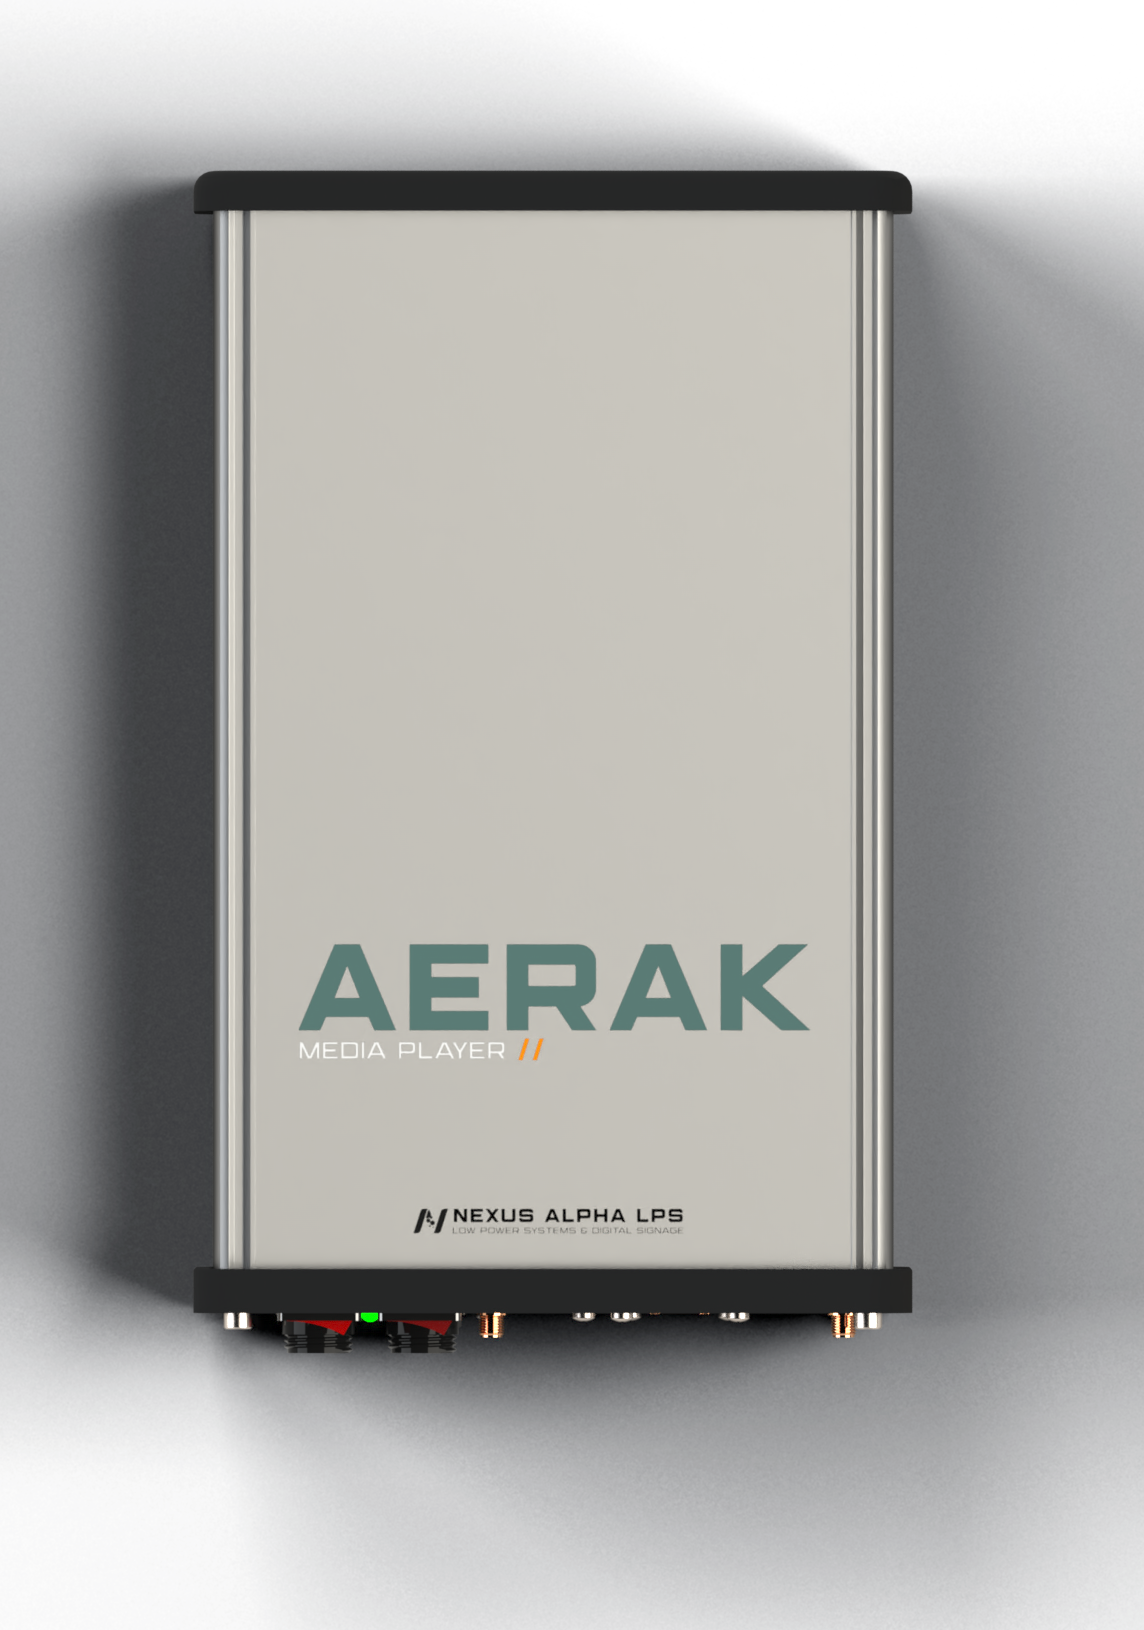 Aerak media player. Concept by Nexus Alpha